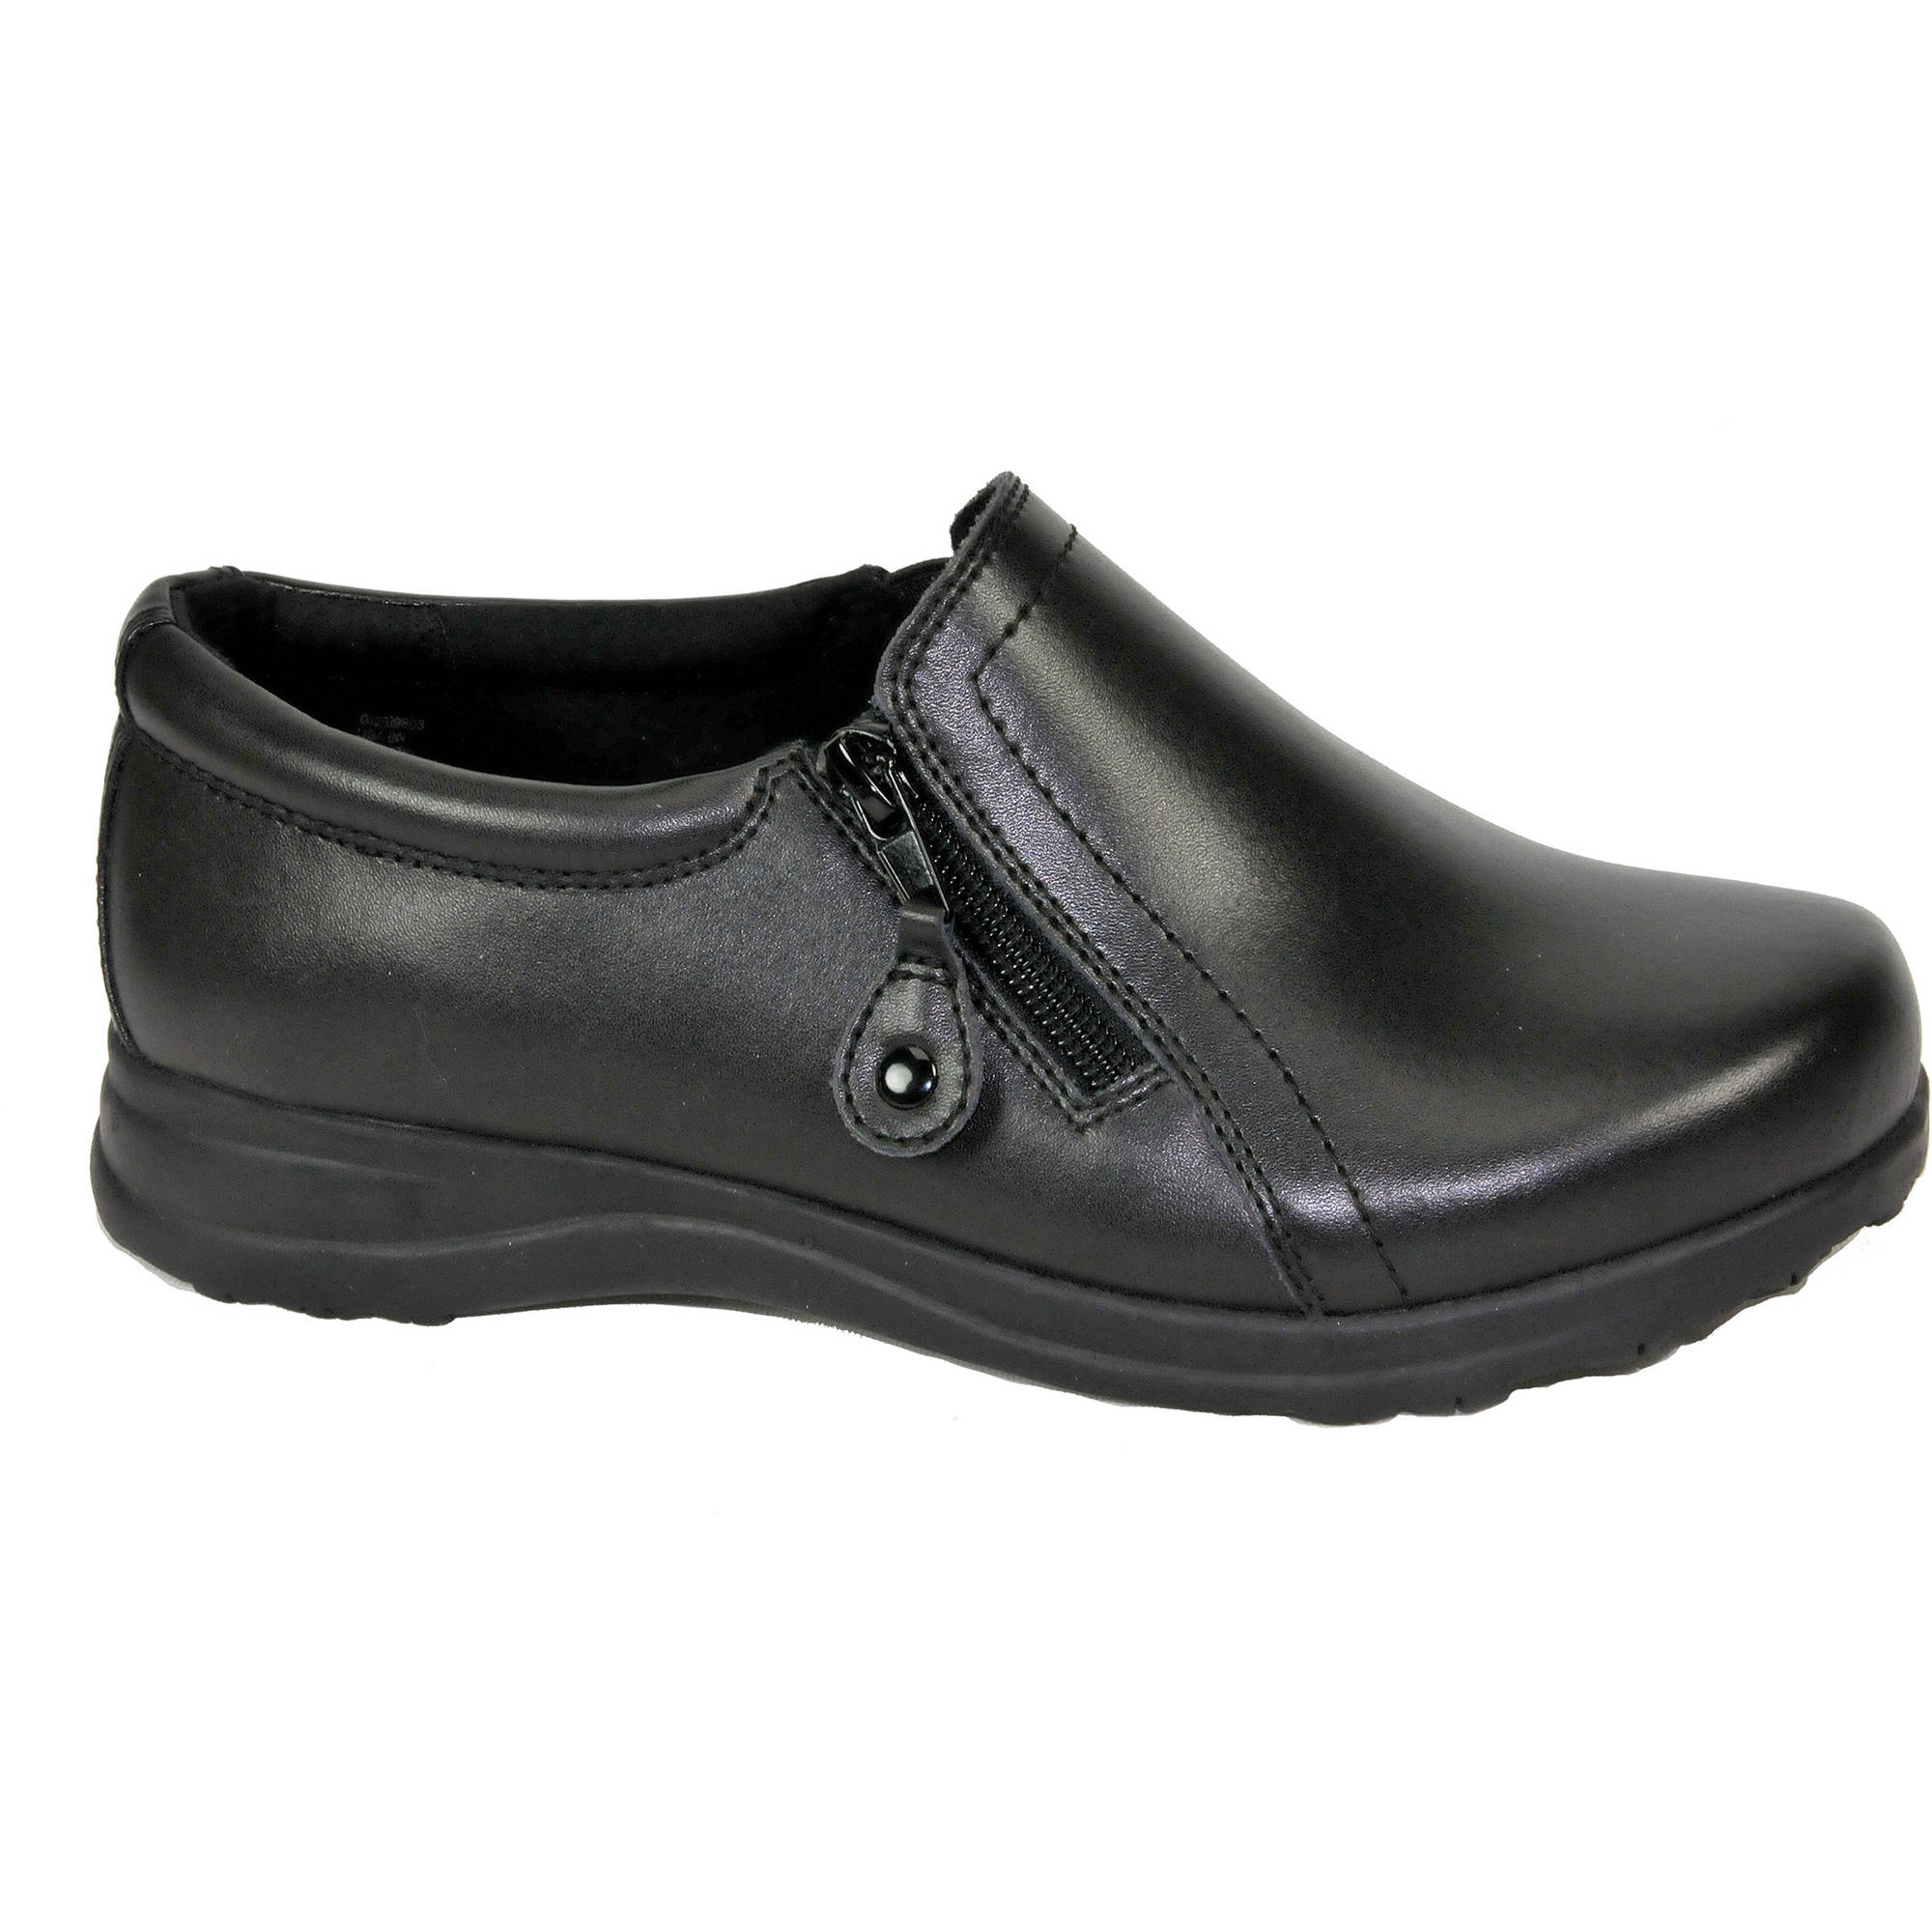 50f9742aae0 Dr. Scholl s Shoes - Dr. Scholl s Men s Griff Wide Width Slip Resistant  Casual Shoe - Walmart.com